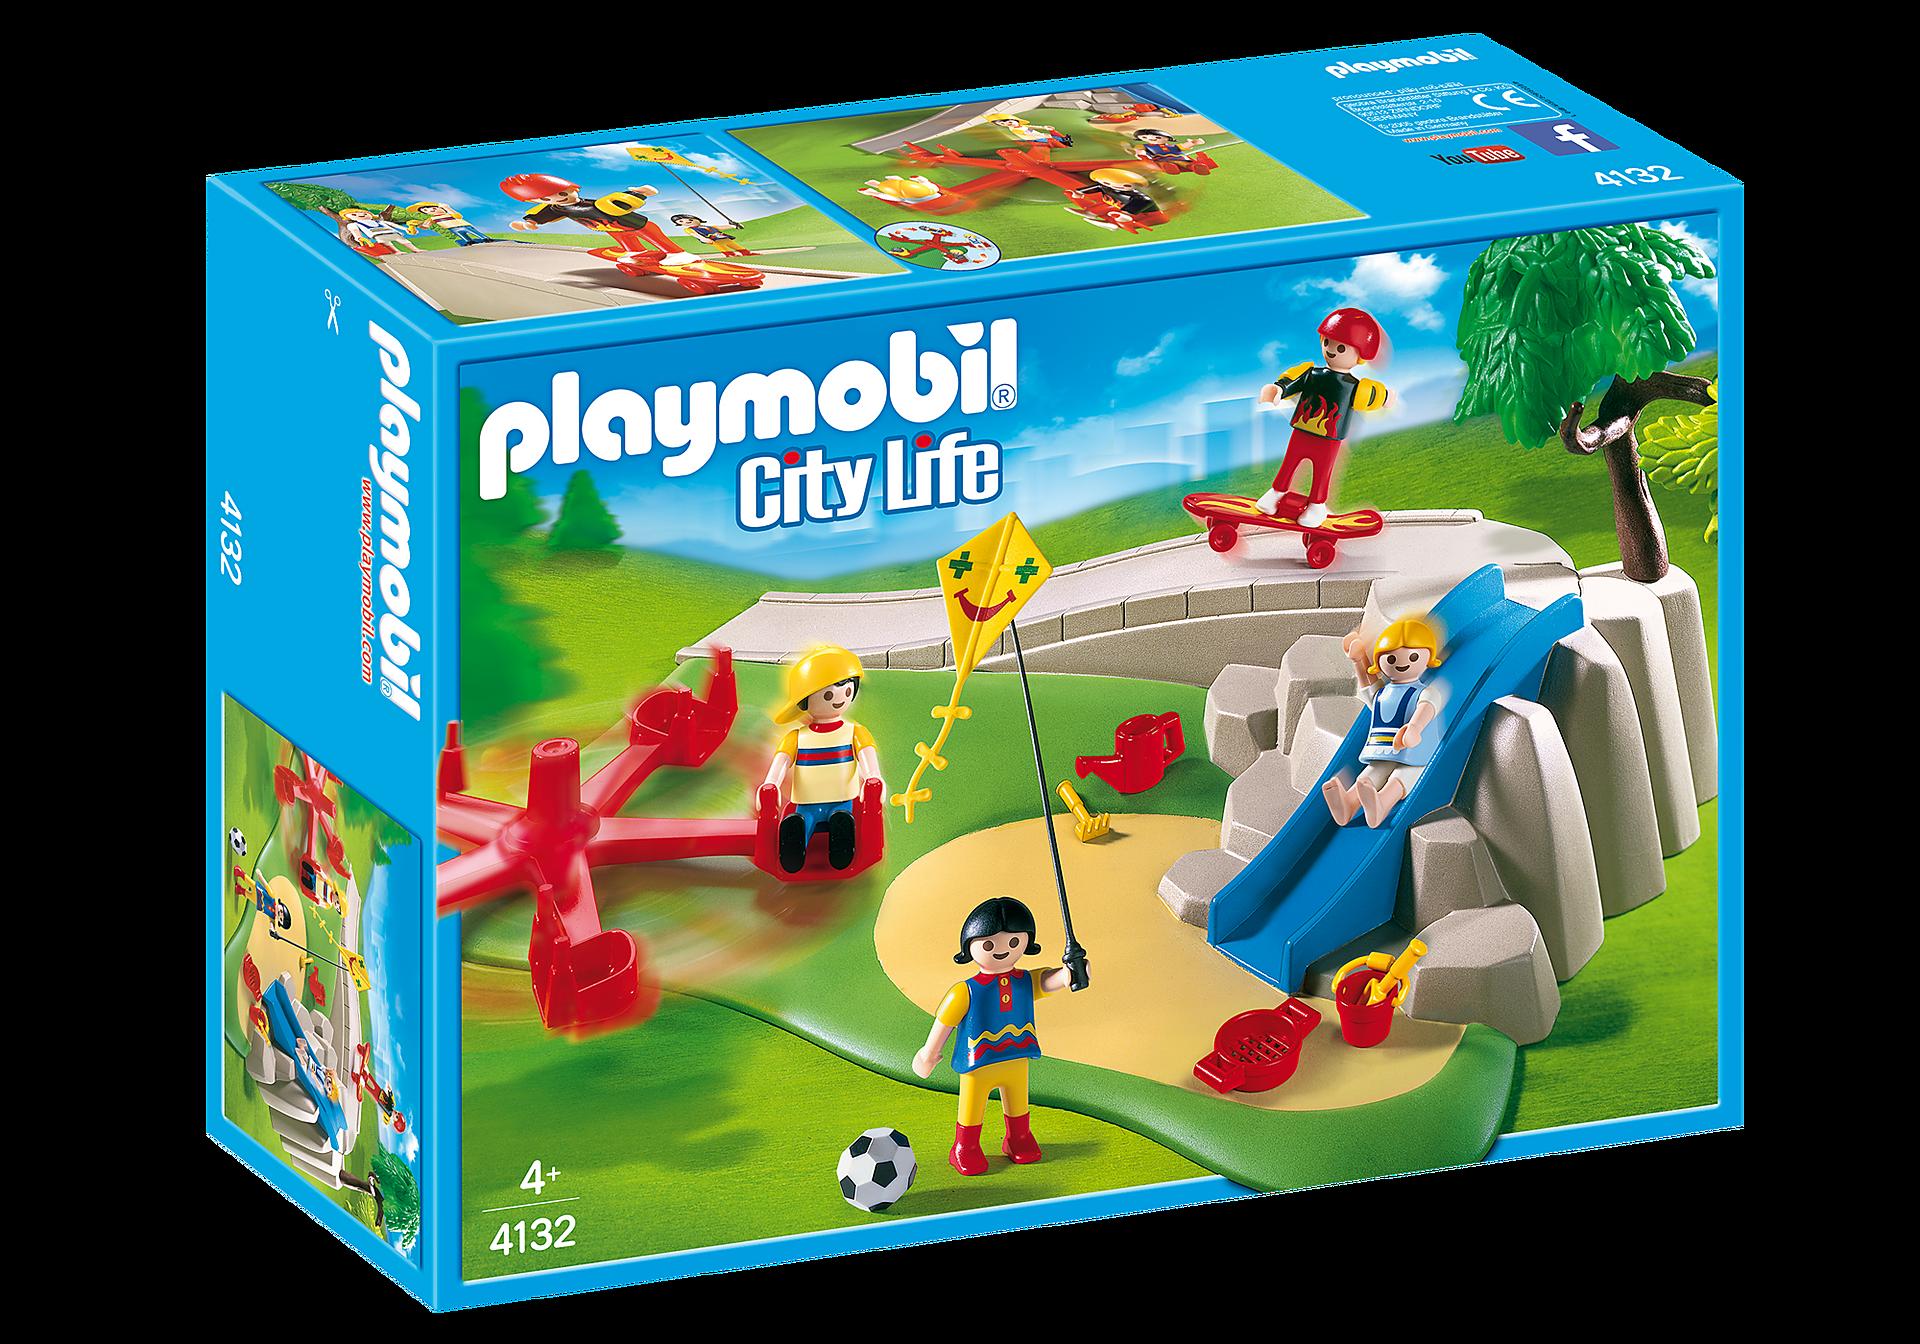 http://media.playmobil.com/i/playmobil/4132_product_box_front/Playground Super Set